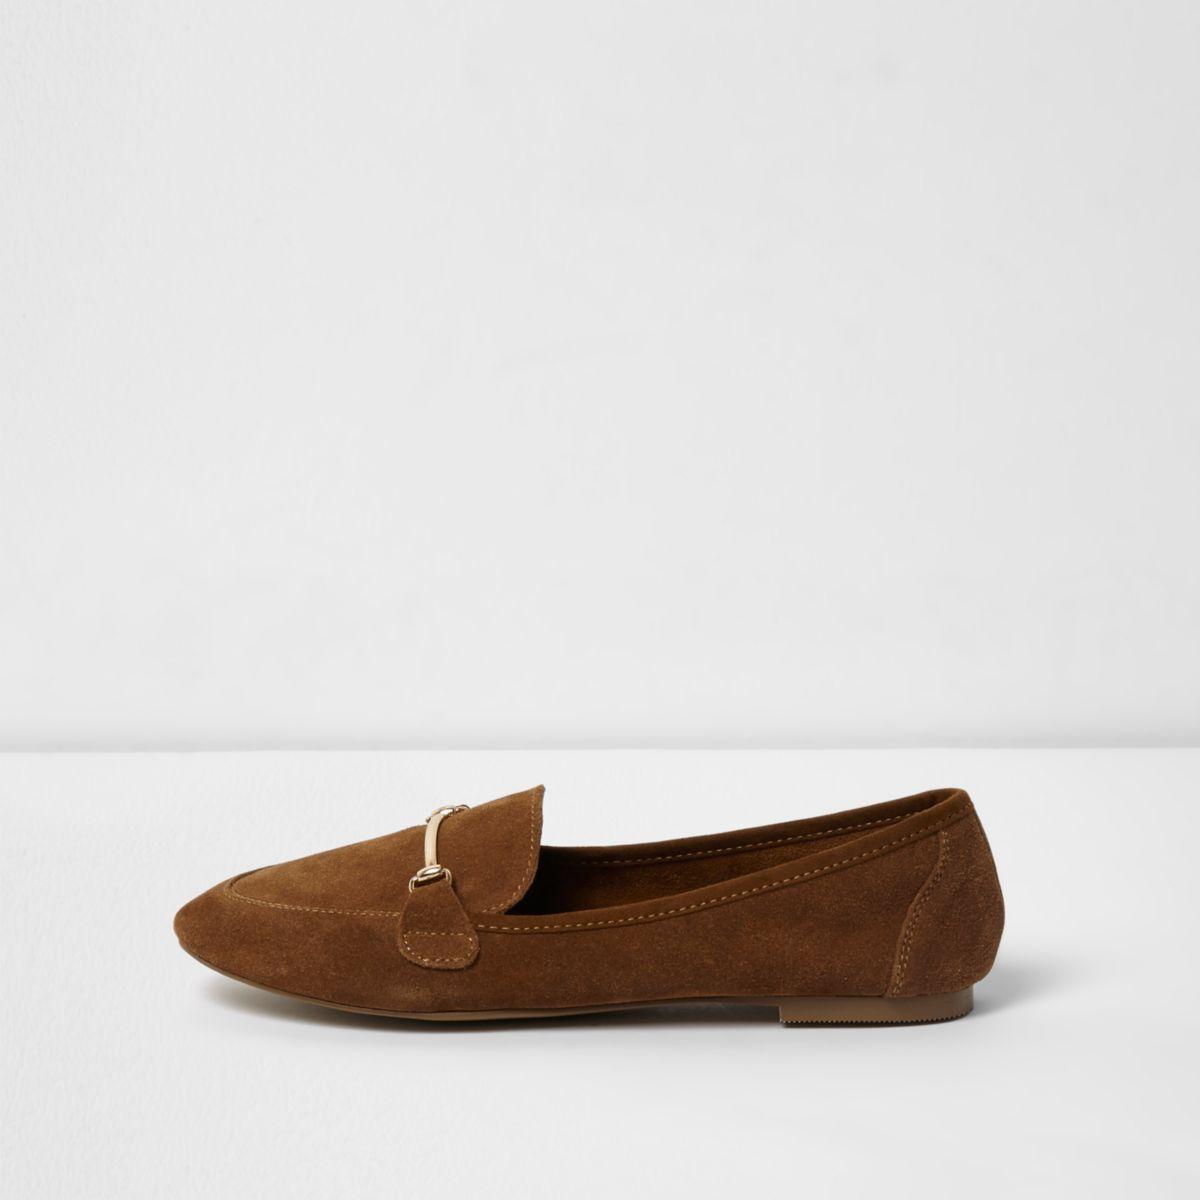 Tan suede snaffle slippers